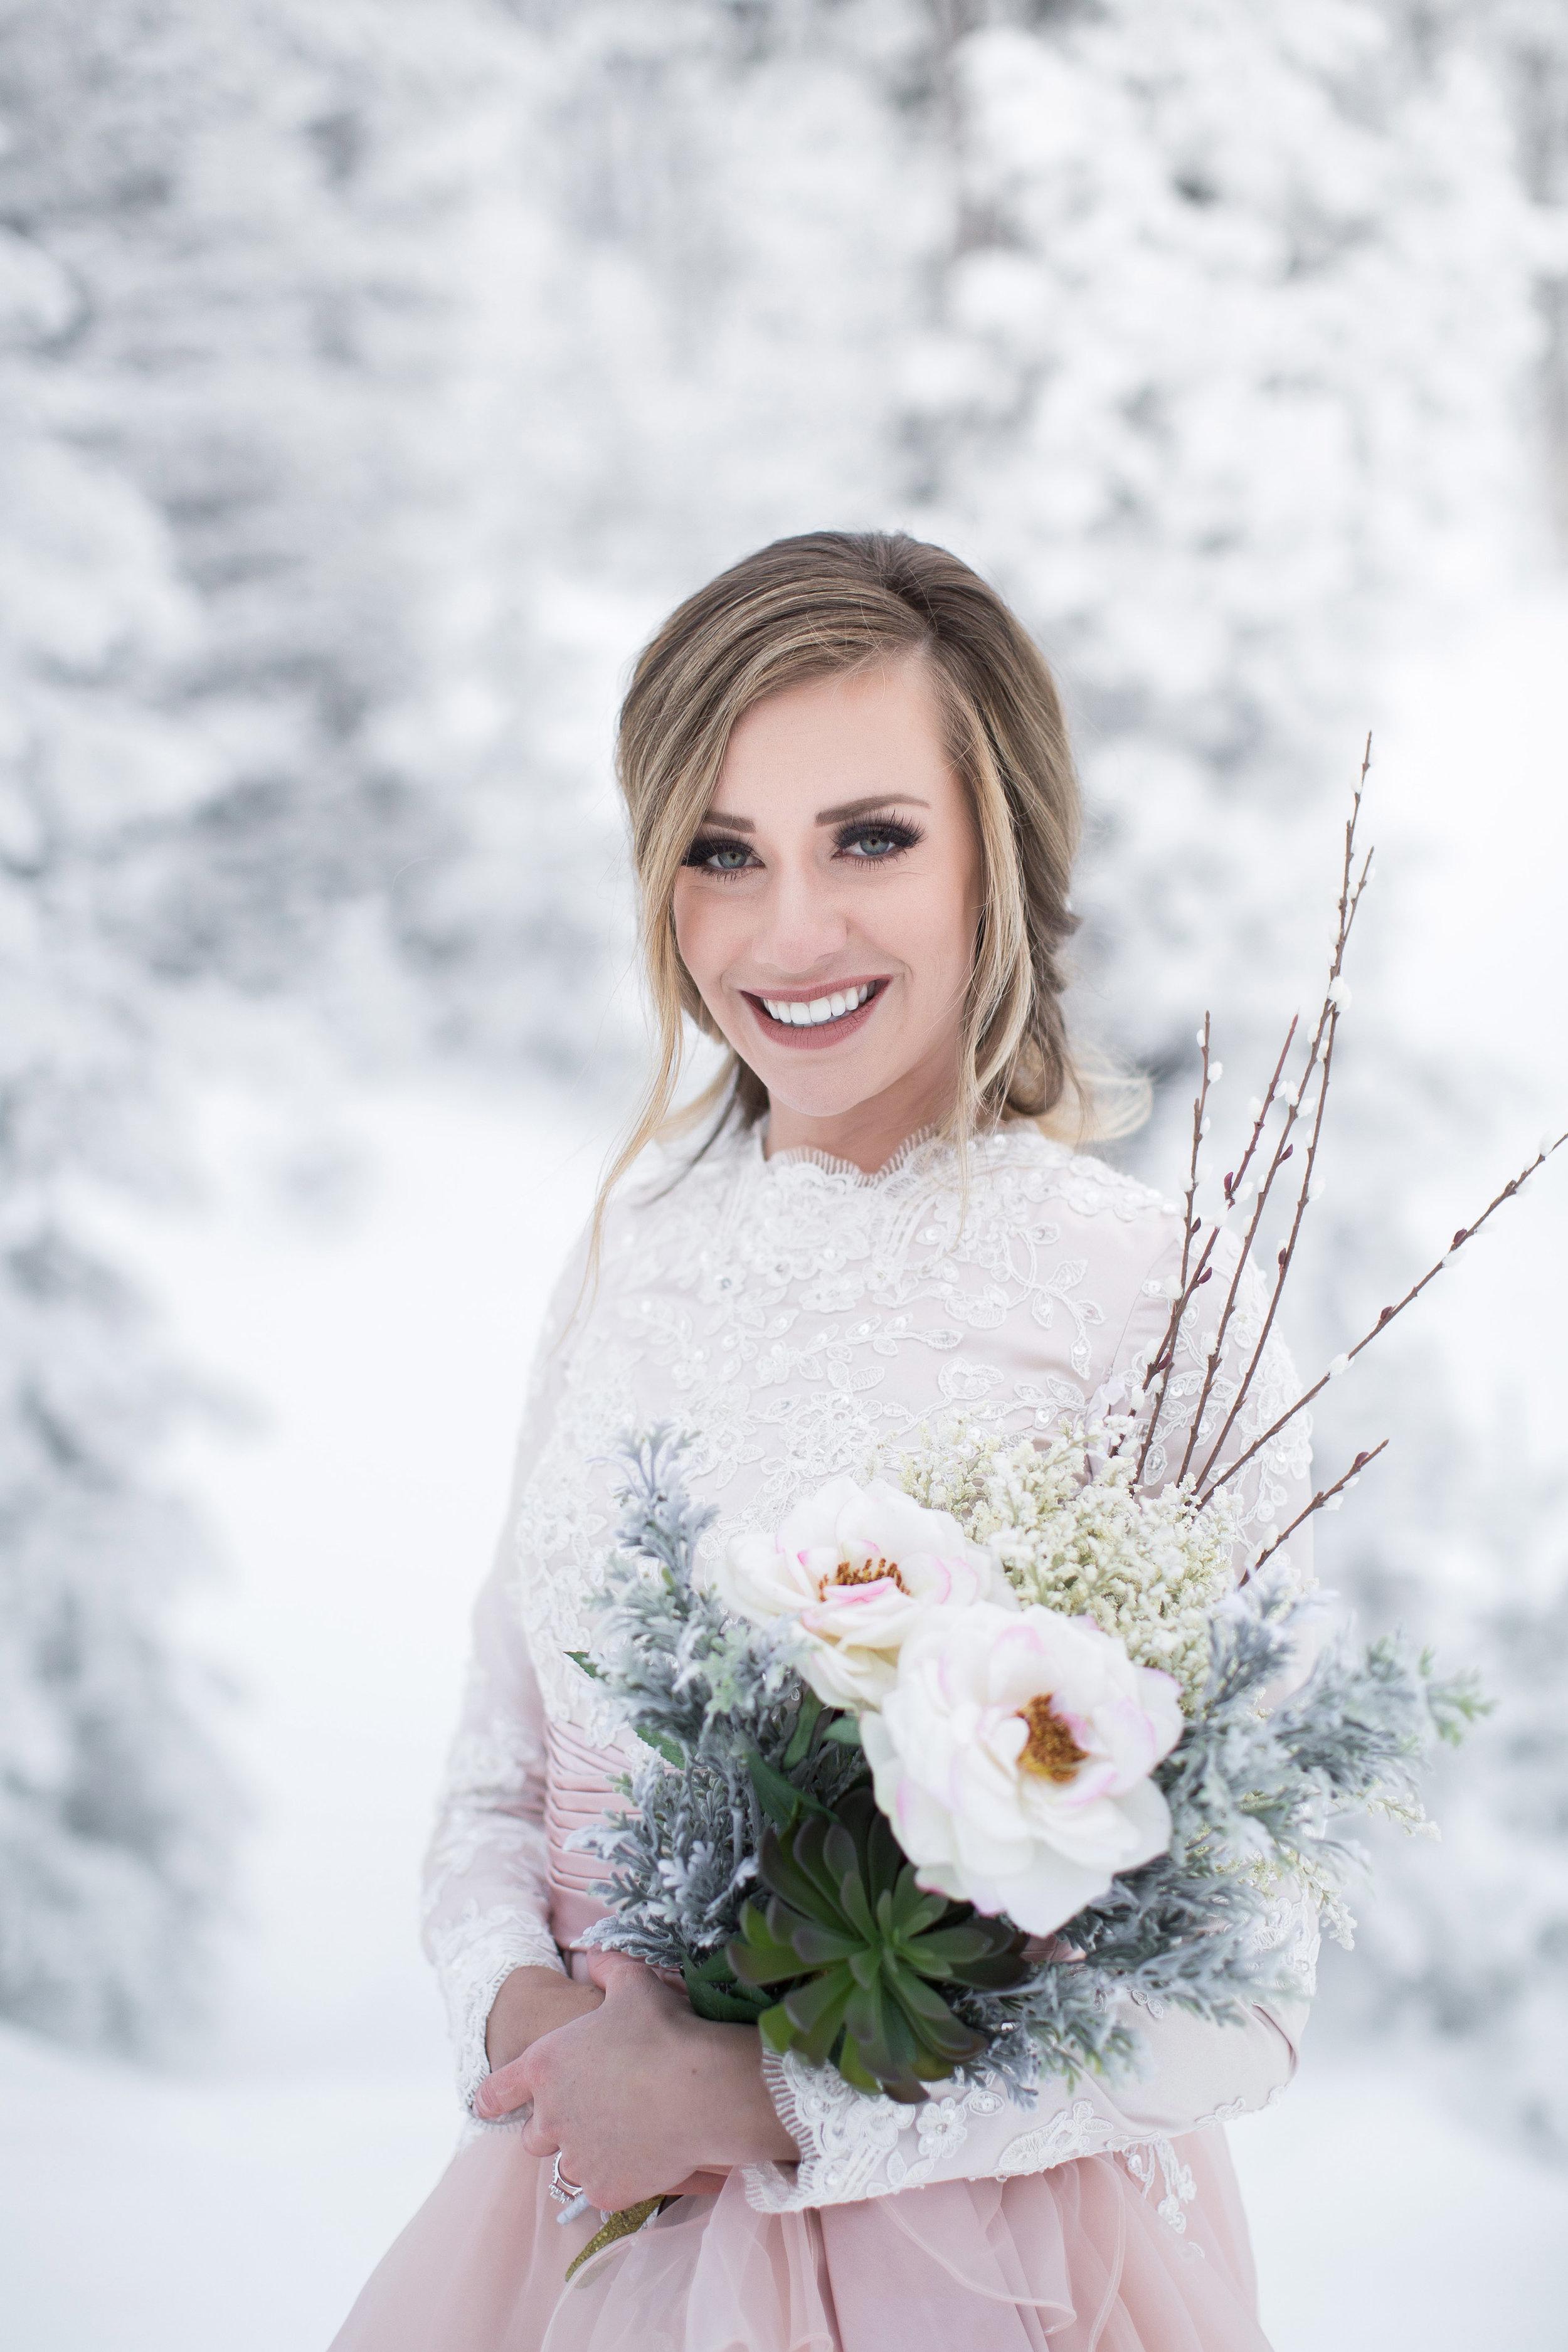 JessicaPorterBridals (39 of 61).jpg